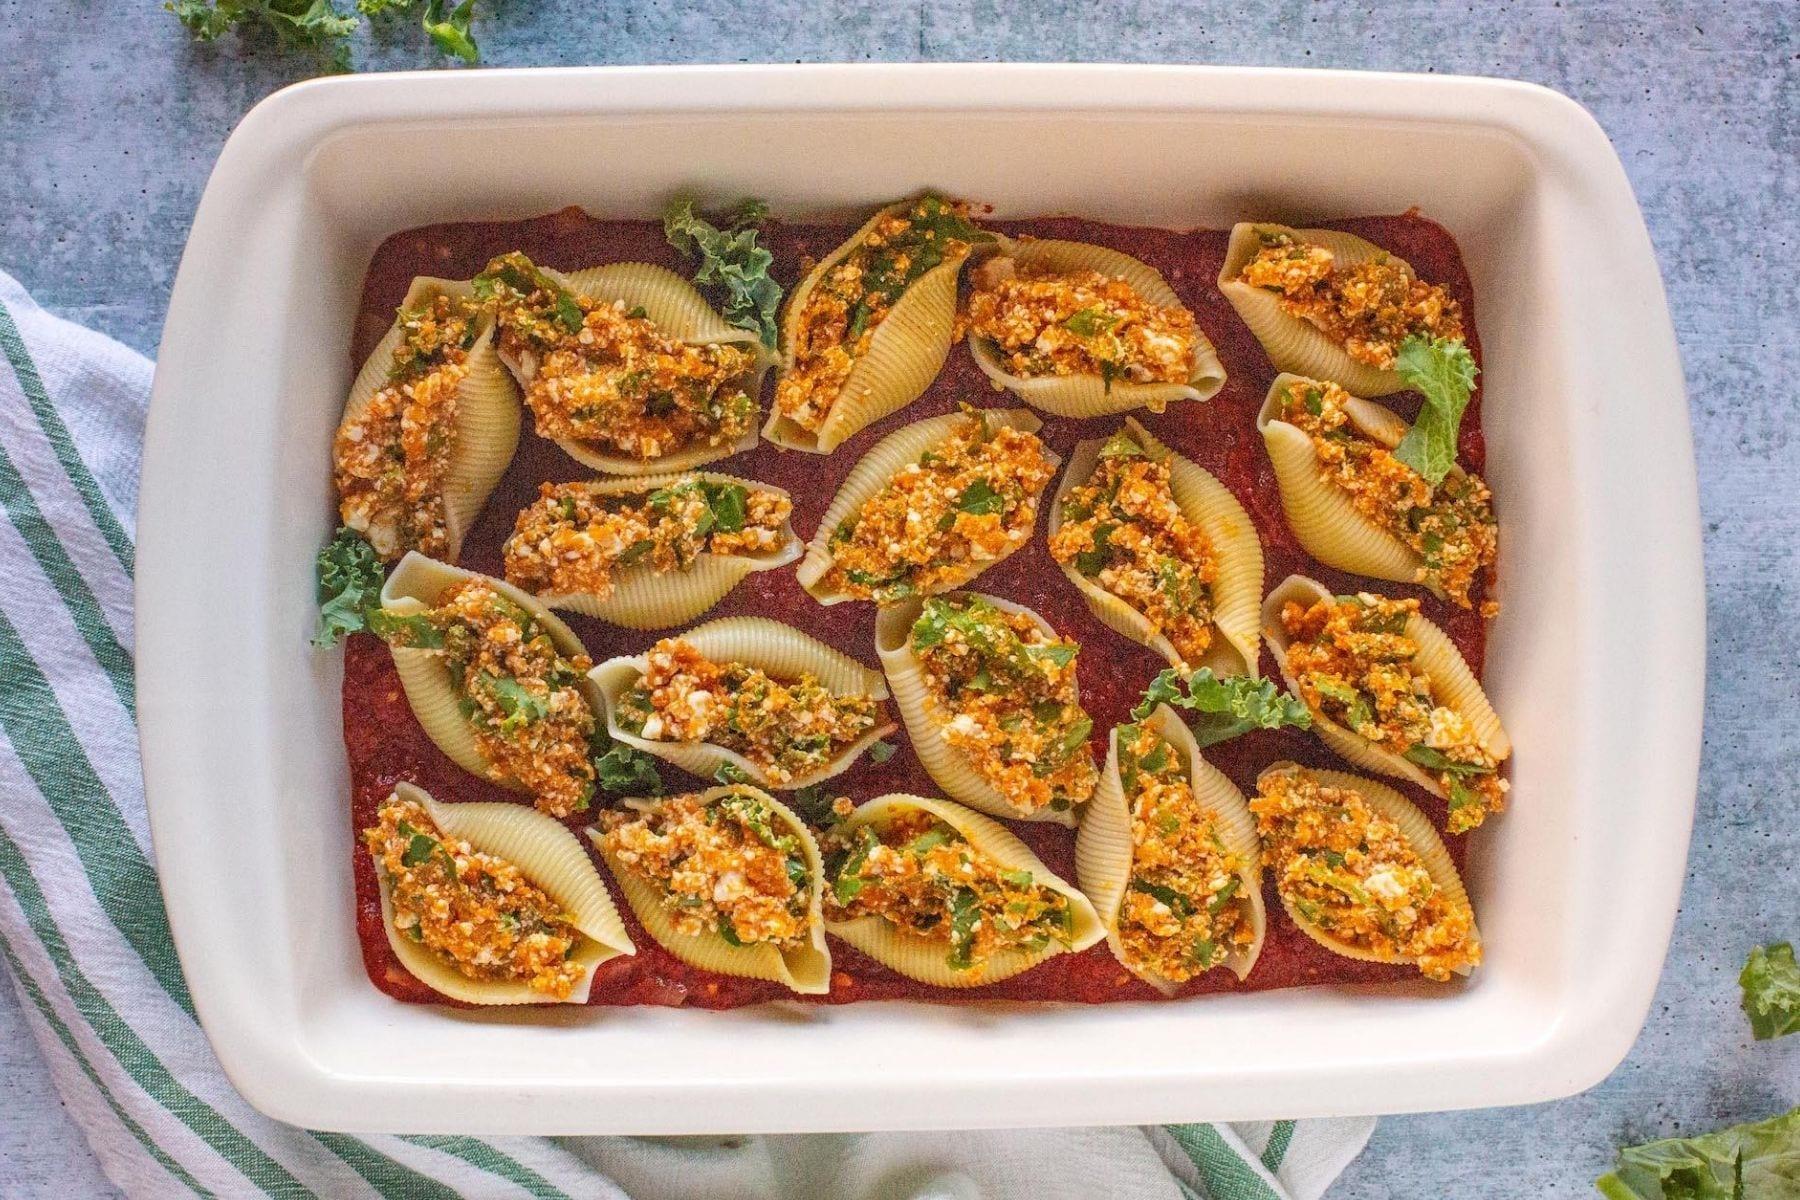 Vegan pumpkin kale stuffed shells in a white baking dish on a grey countertop